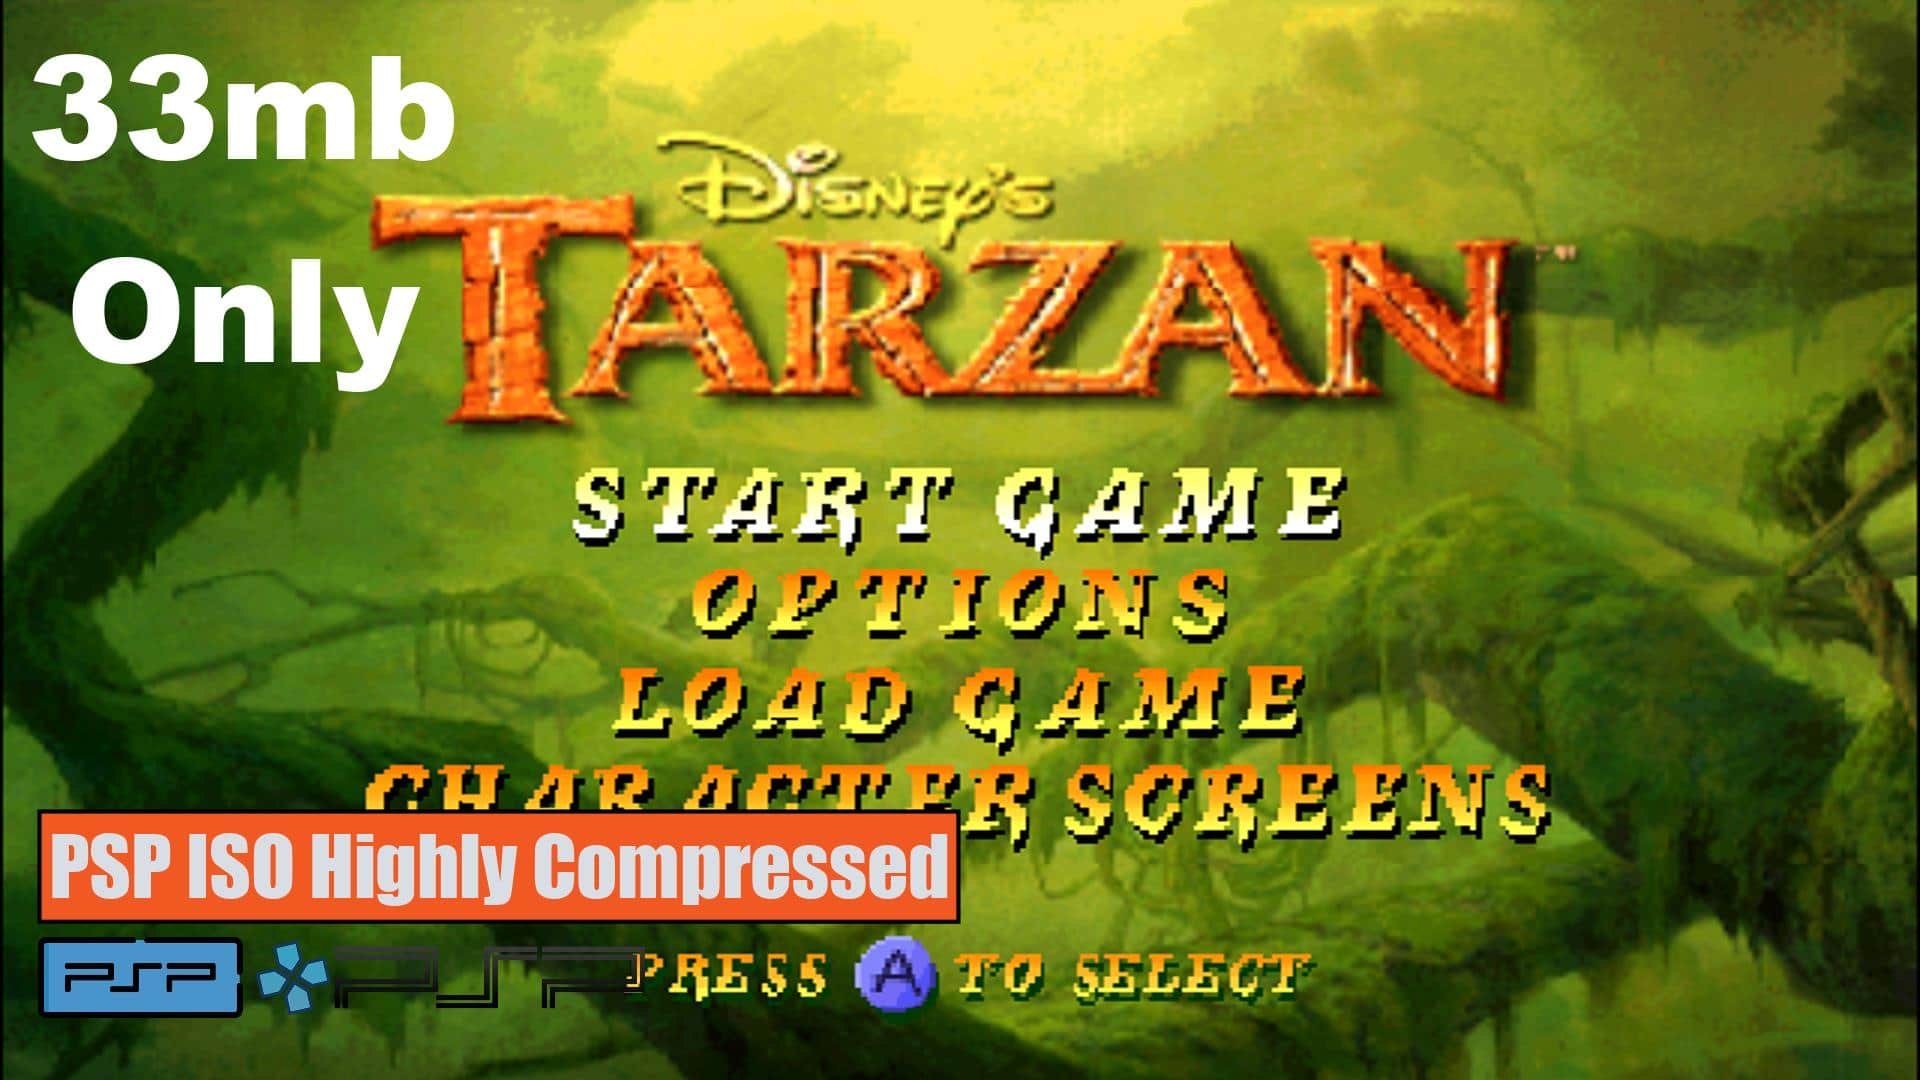 Disney Tarzan PSP ISO Highly Compressed